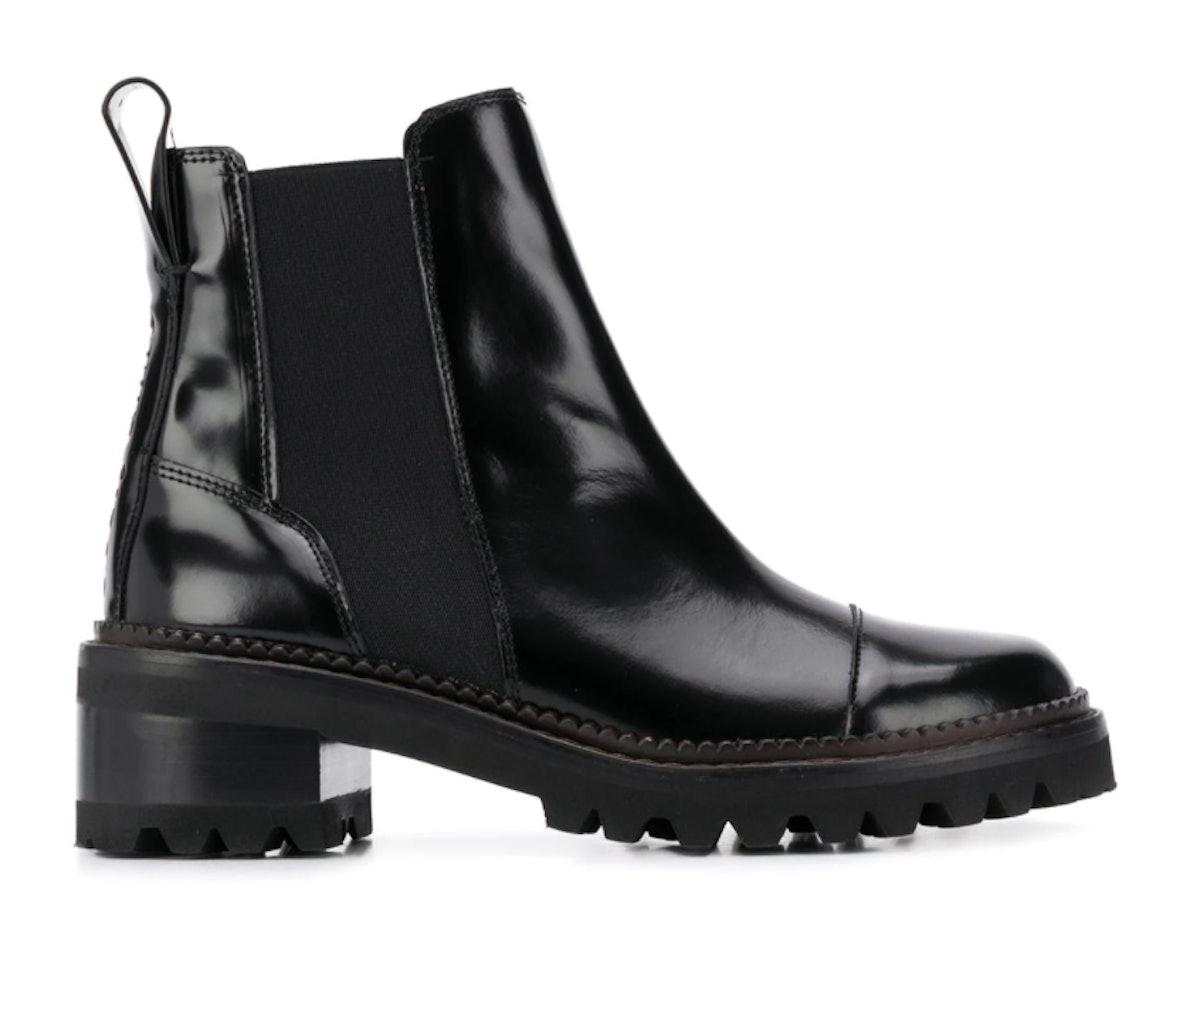 Chloé black leather chelsea boots.